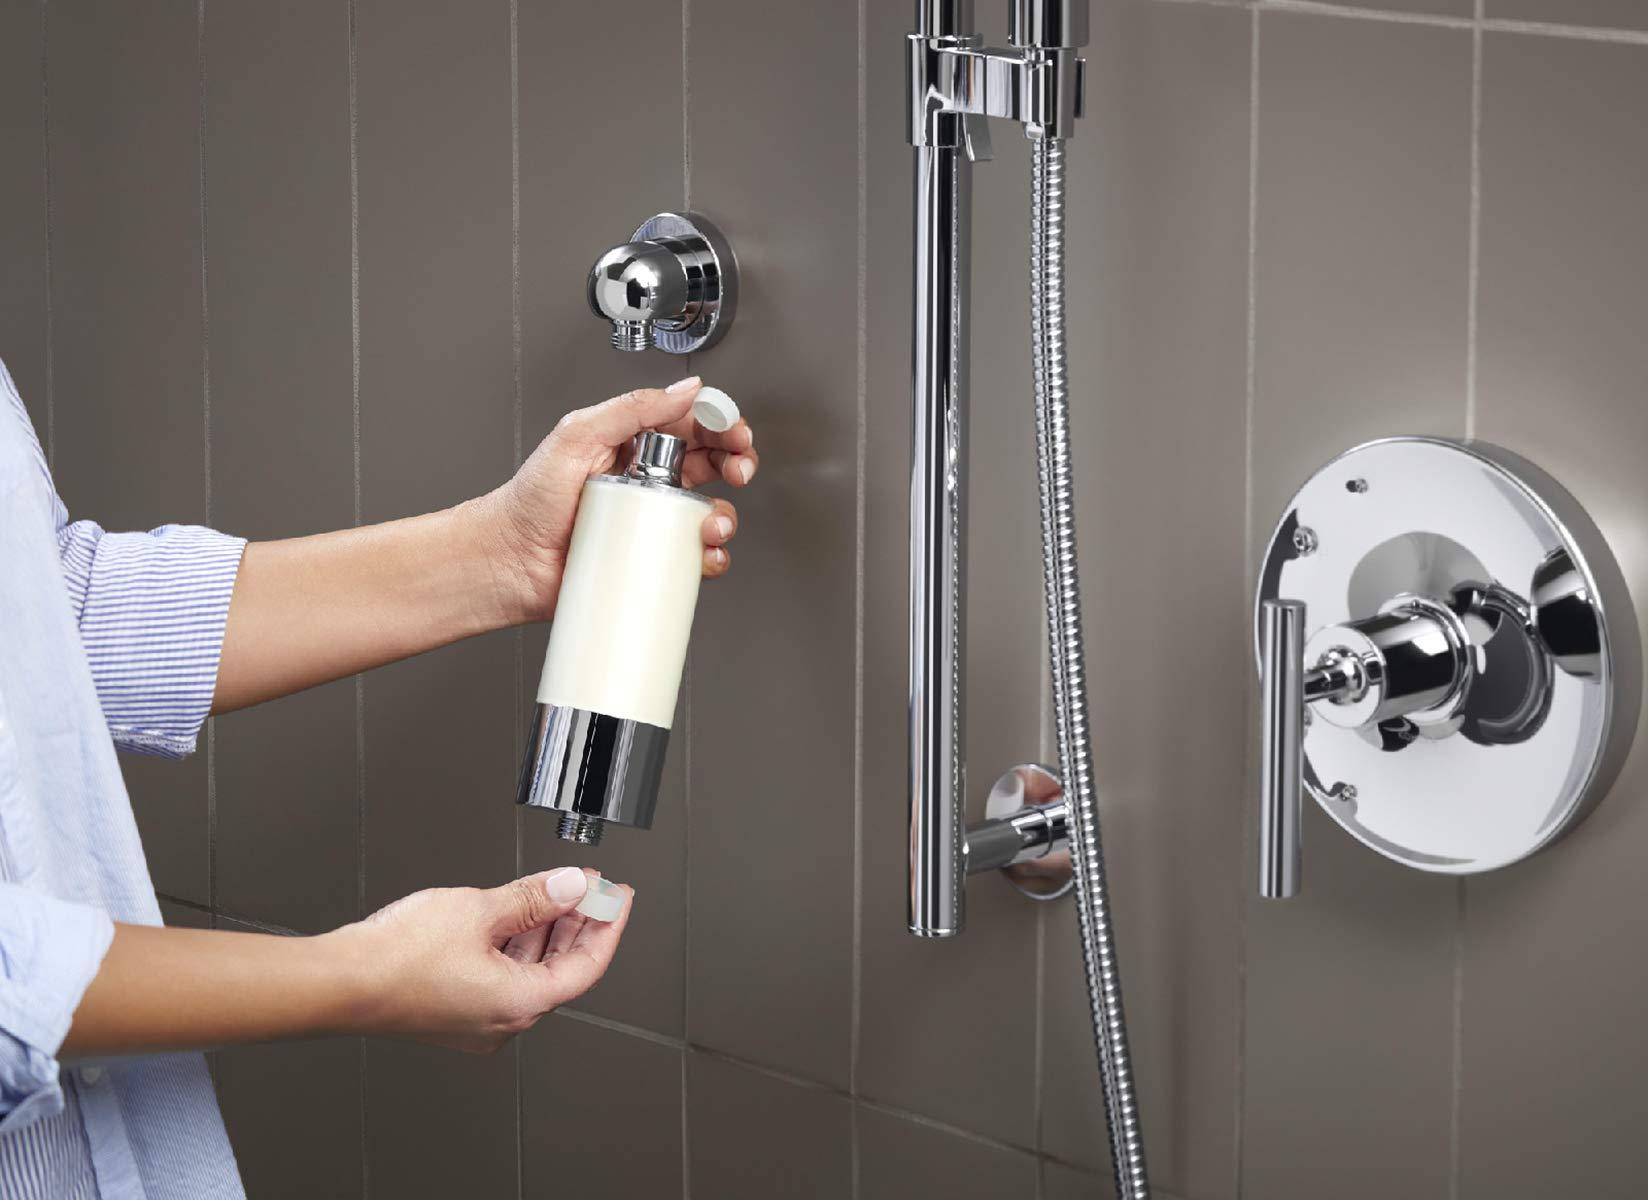 Kohler 30646-CP Aquifer Shower Water Filtration System, Reduce Chlorine and Odor, Includes Filter Replacement by Kohler (Image #12)